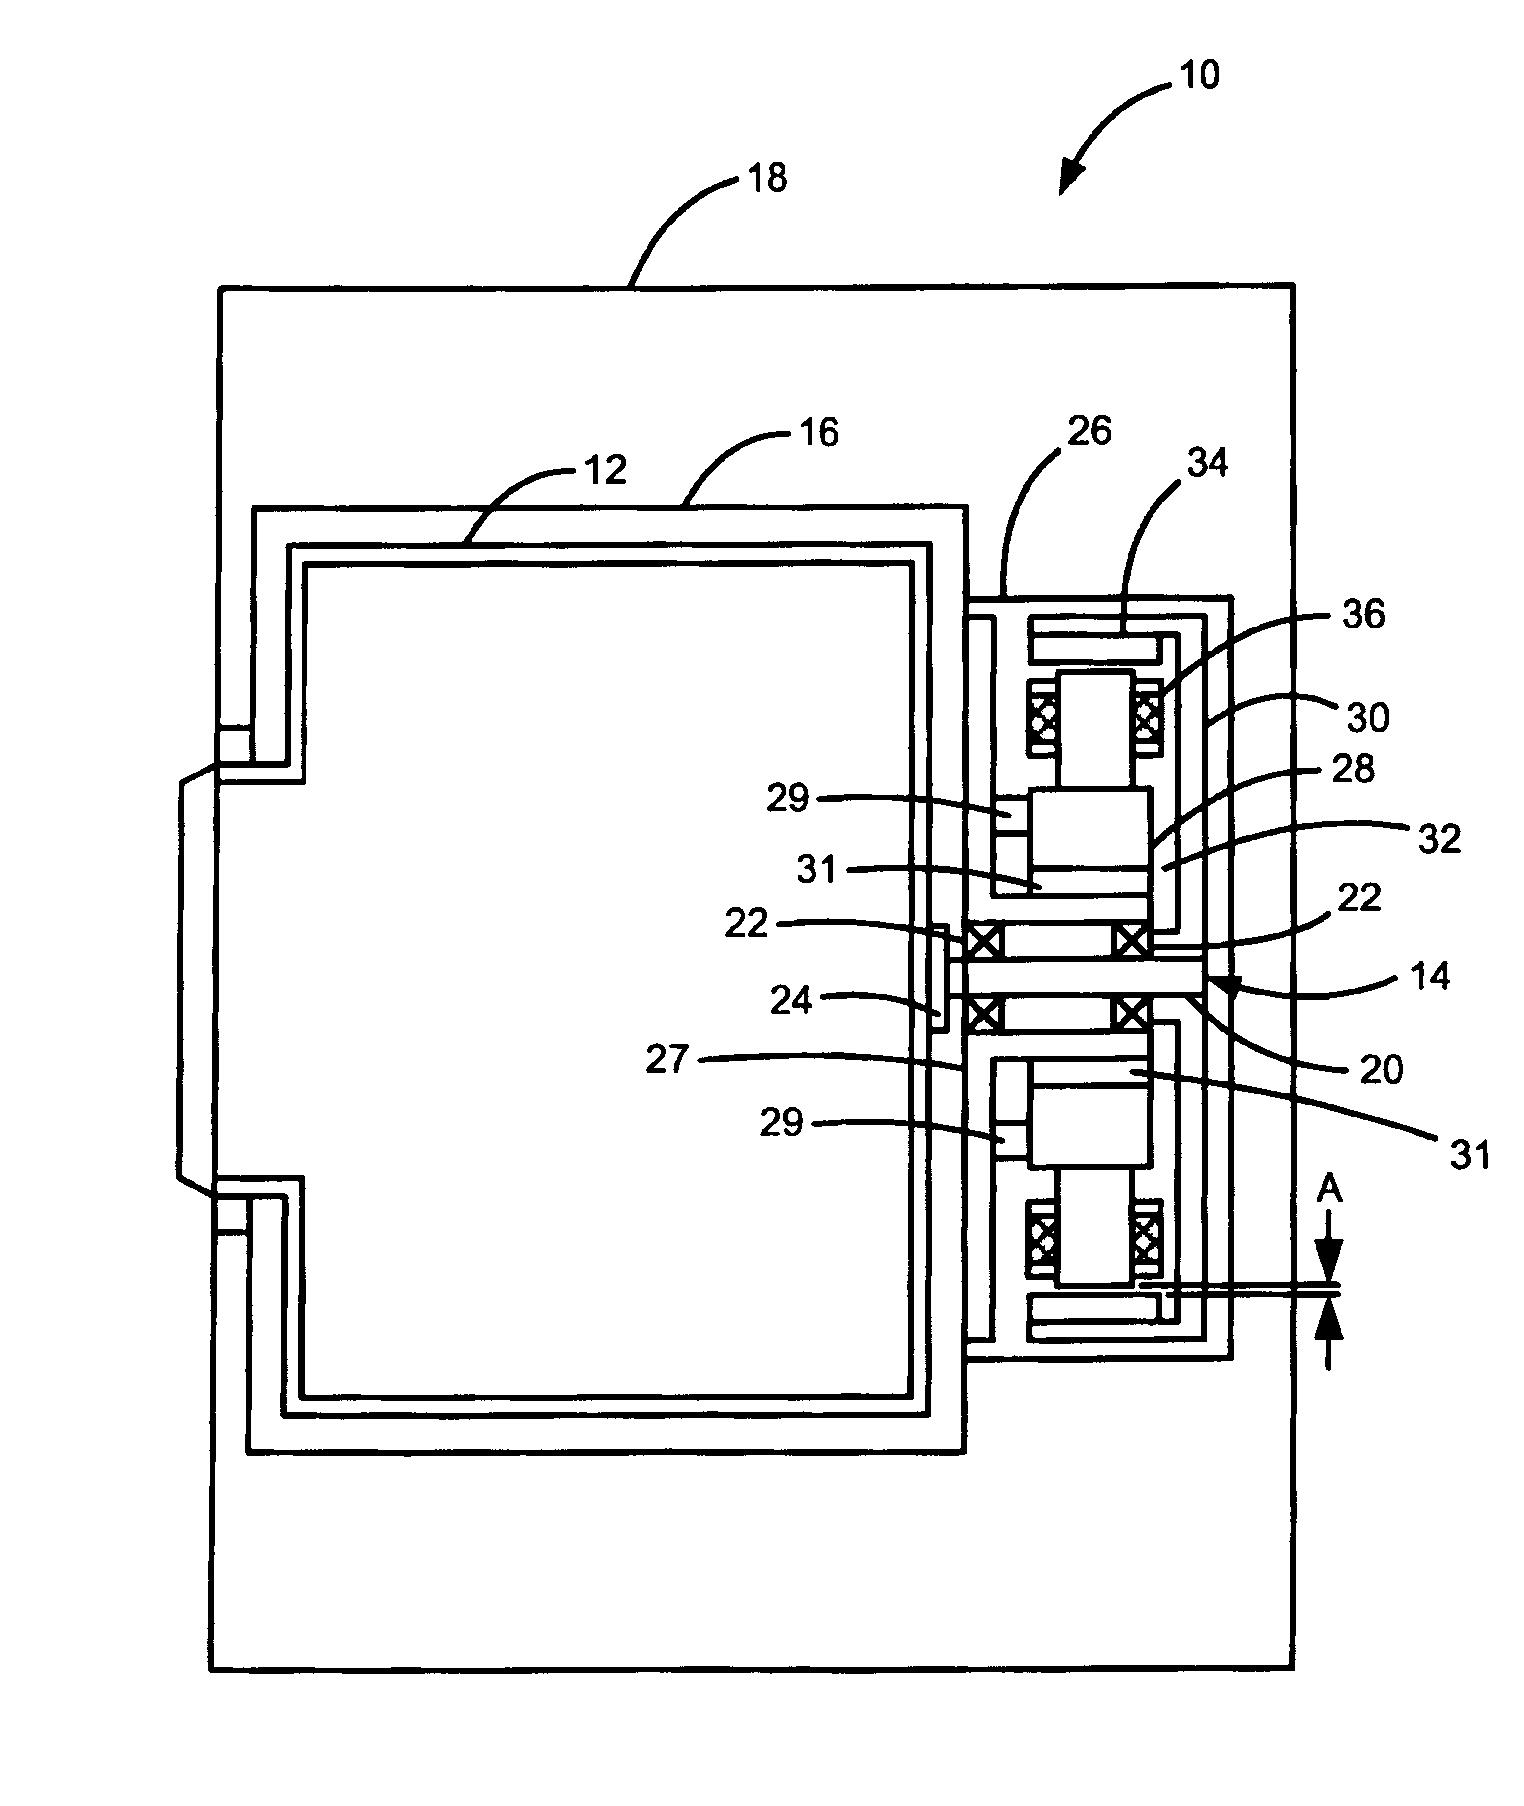 Patent Us20050088047 Brushless Permanent Magnet Motor